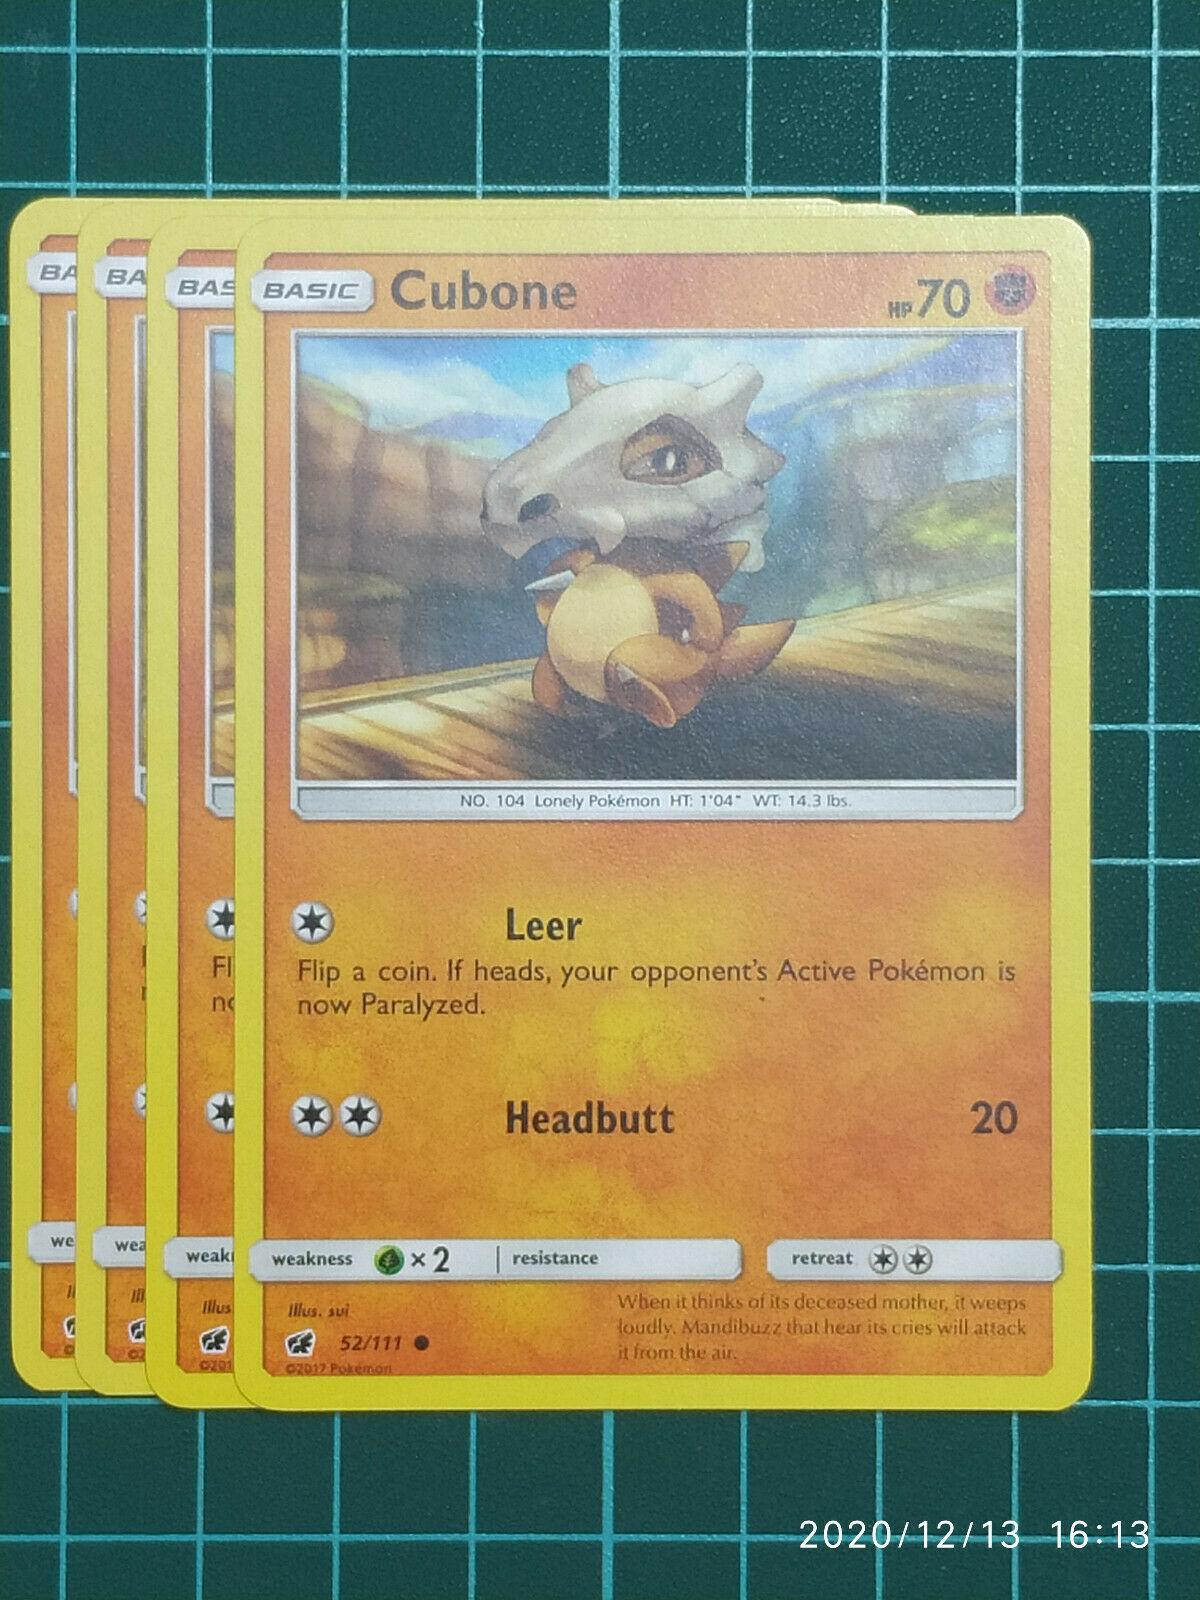 POKEMON CARD - 4 x Cubone 52/111 - Common - S&M Crimson invasion - NM - Image 1